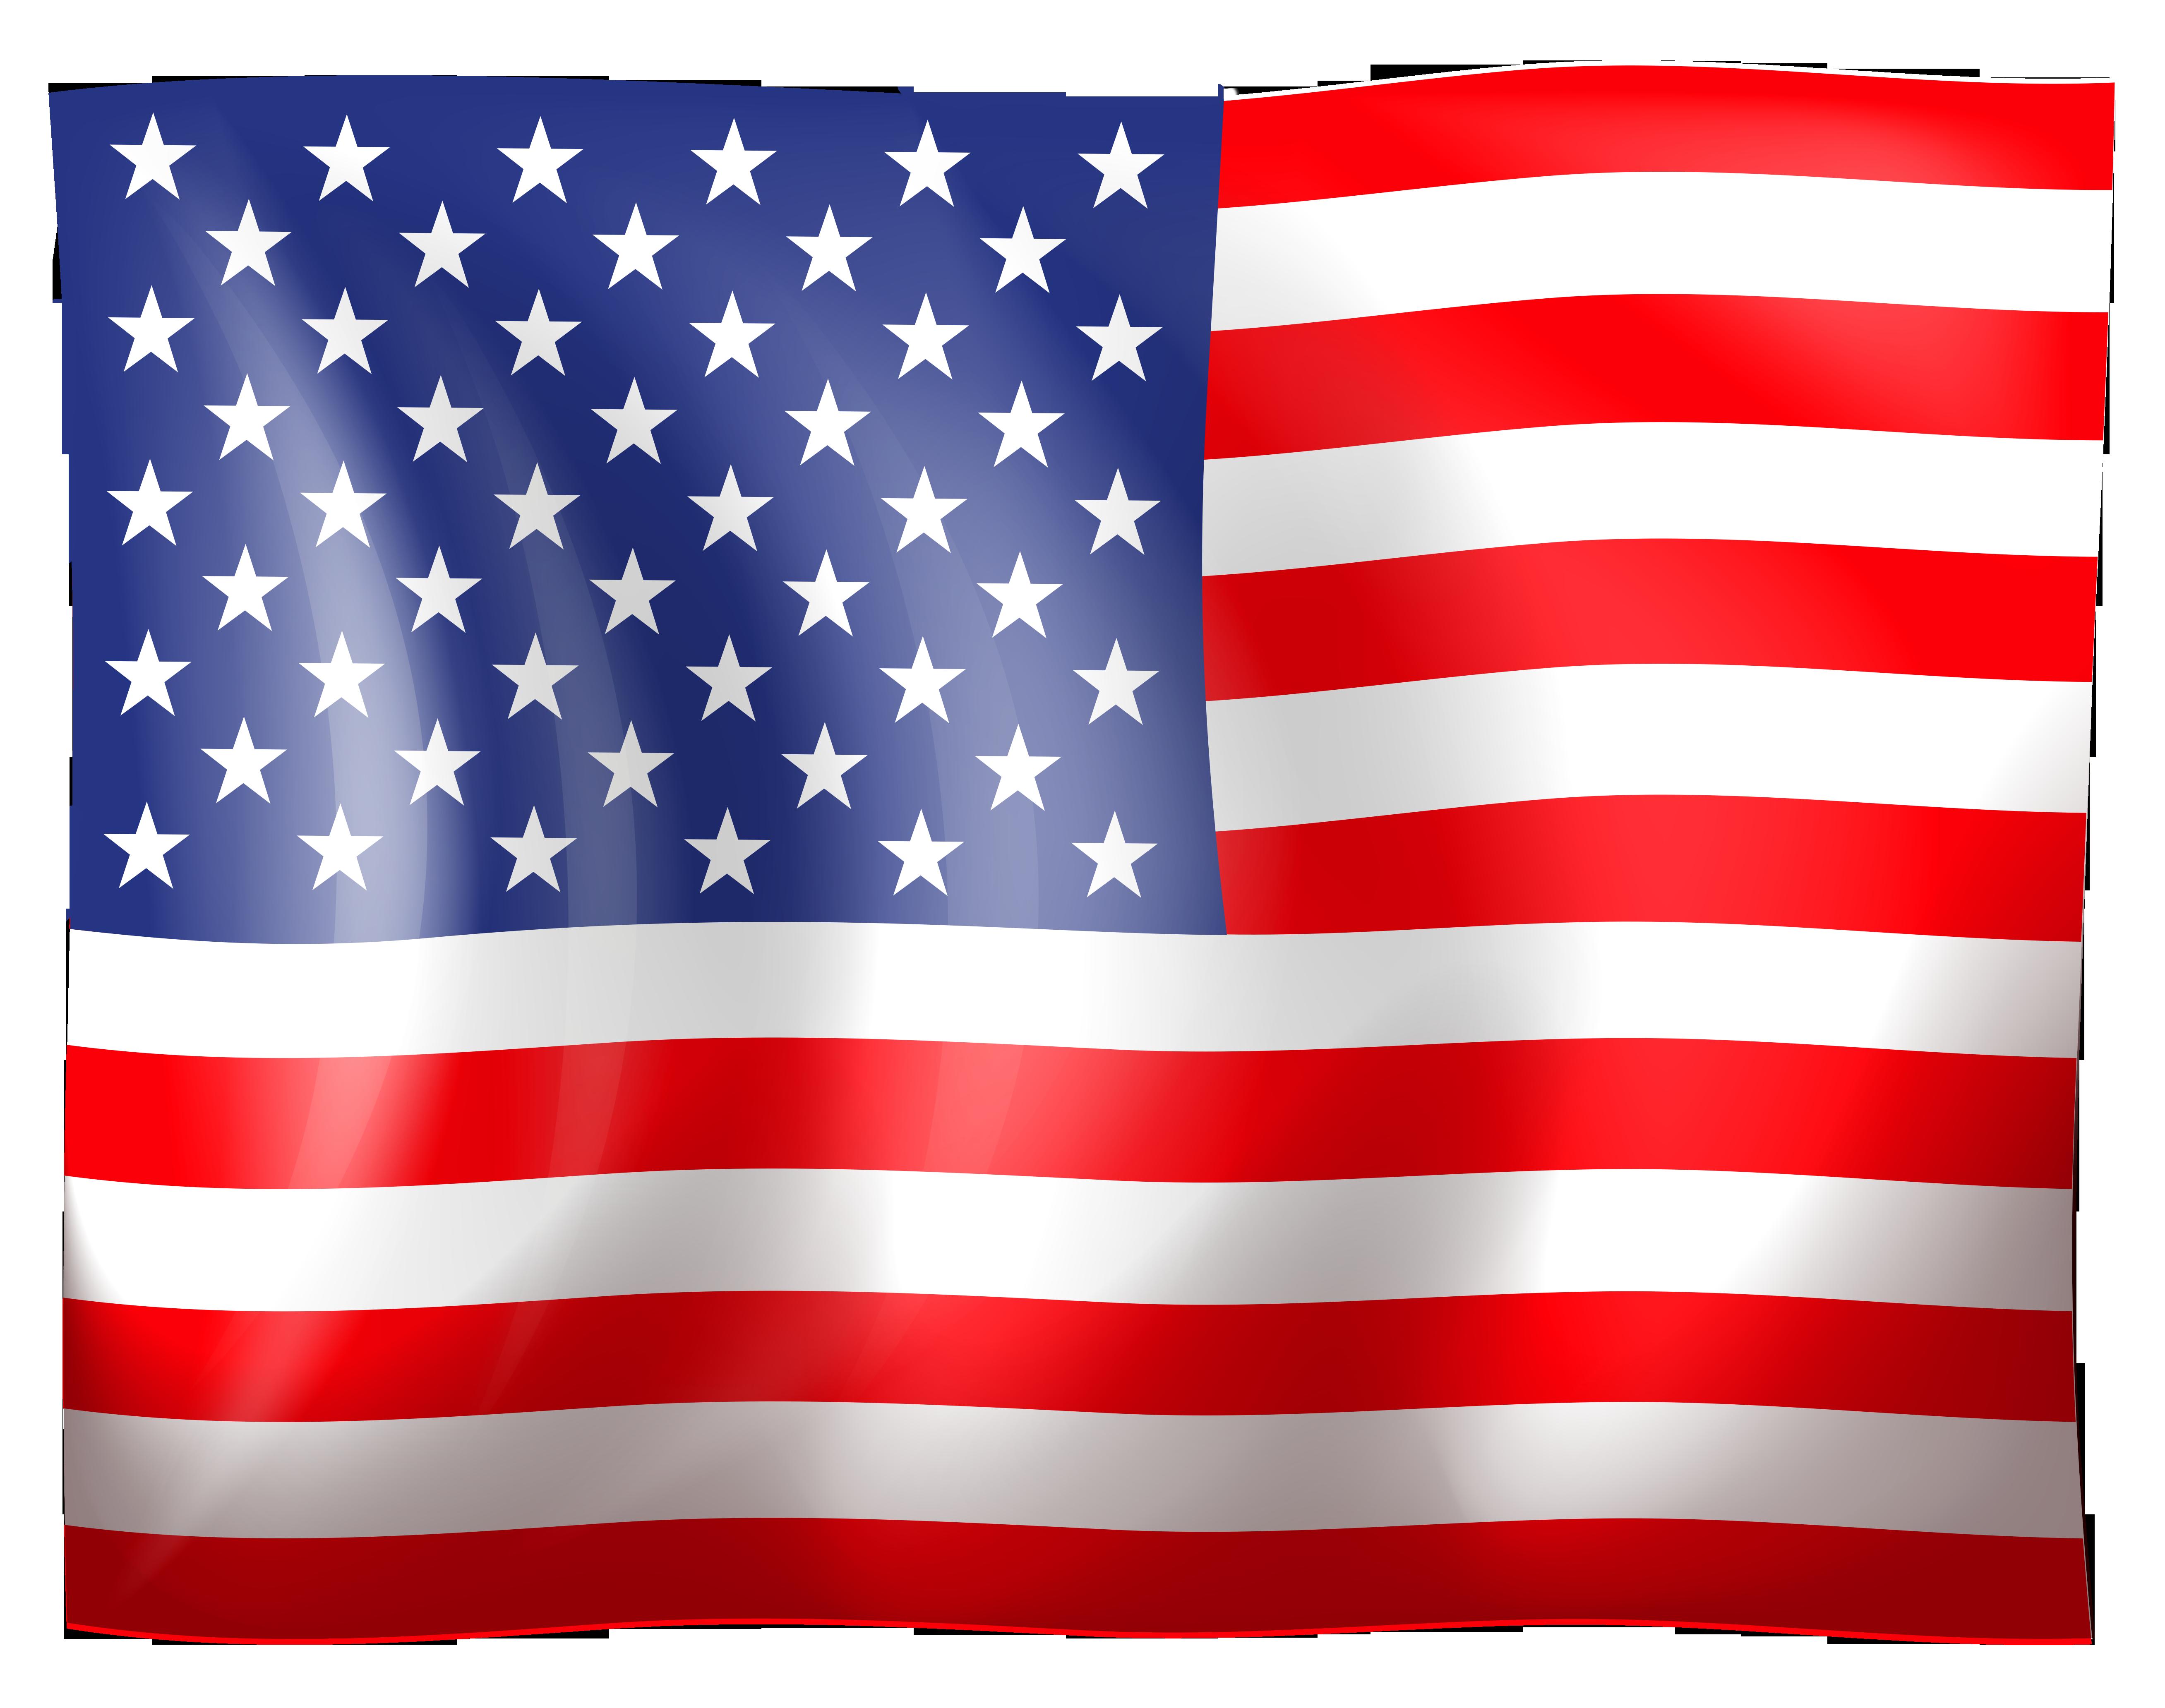 Usa Flag Clipart 0 Clipartcow 2-Usa flag clipart 0 clipartcow 2-16